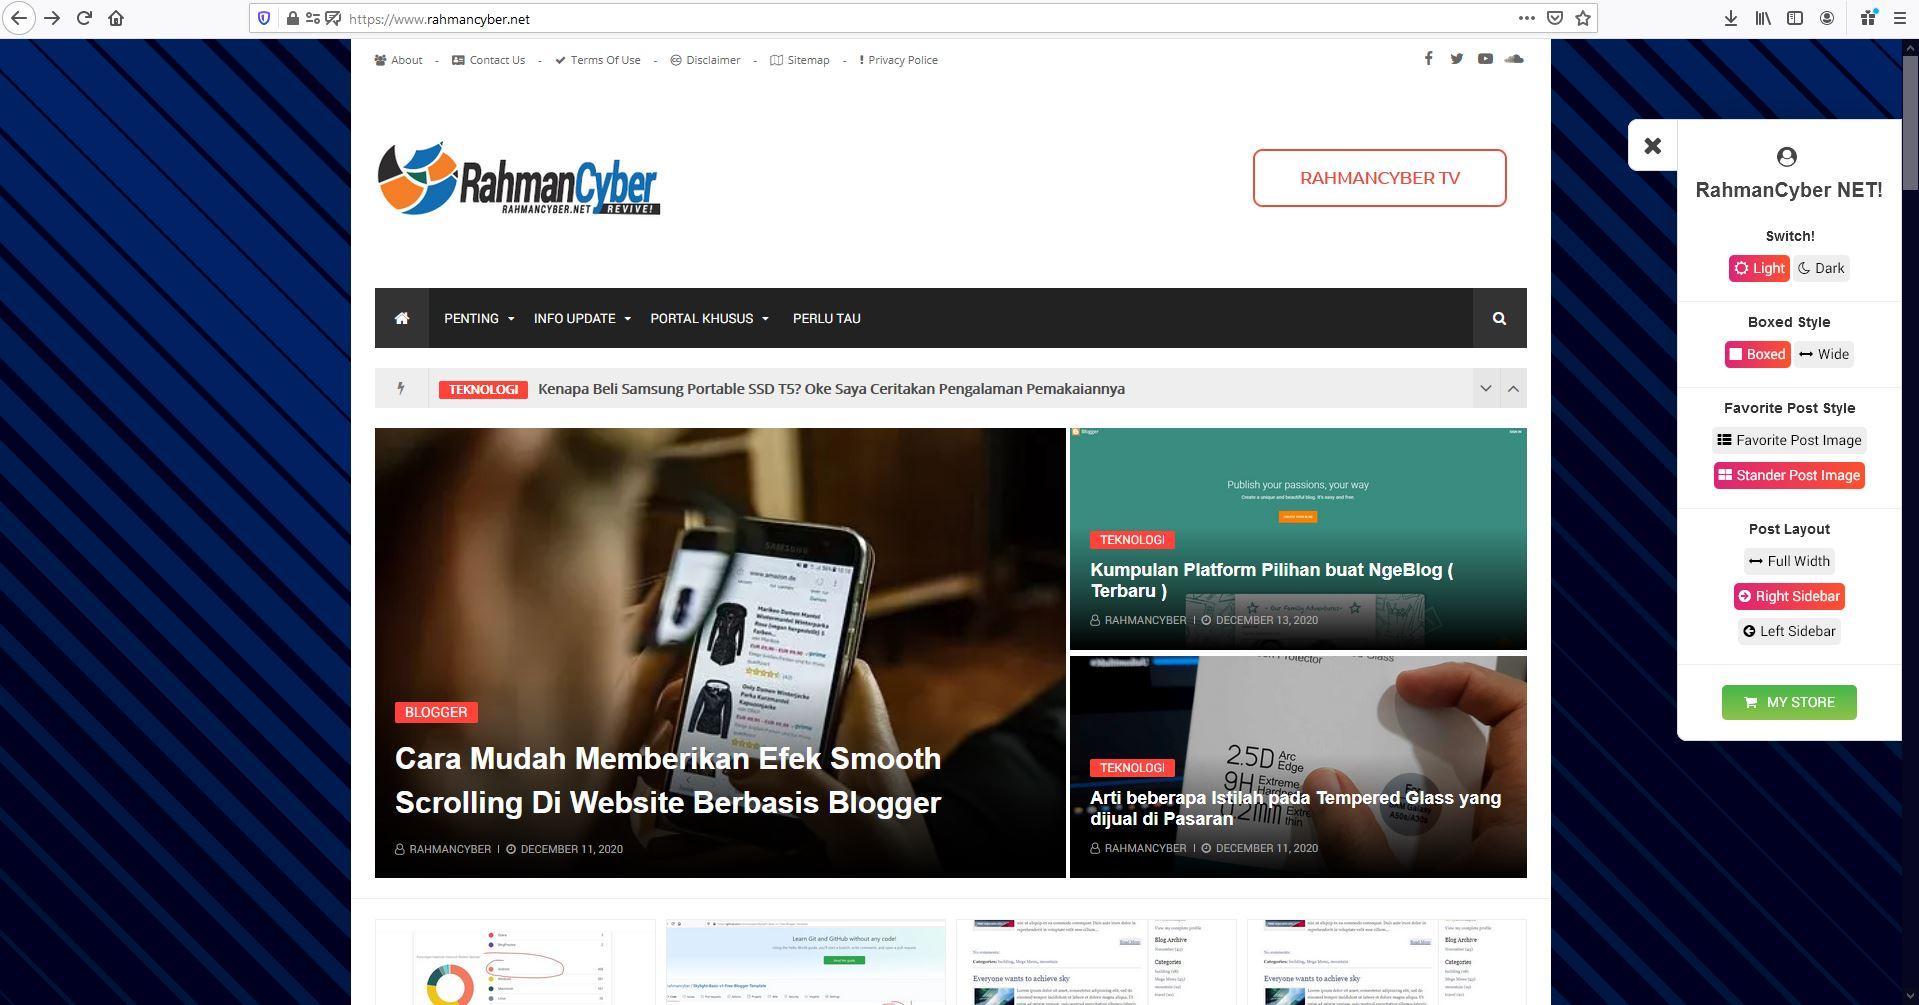 Website RahmanCyber NET Terbaru